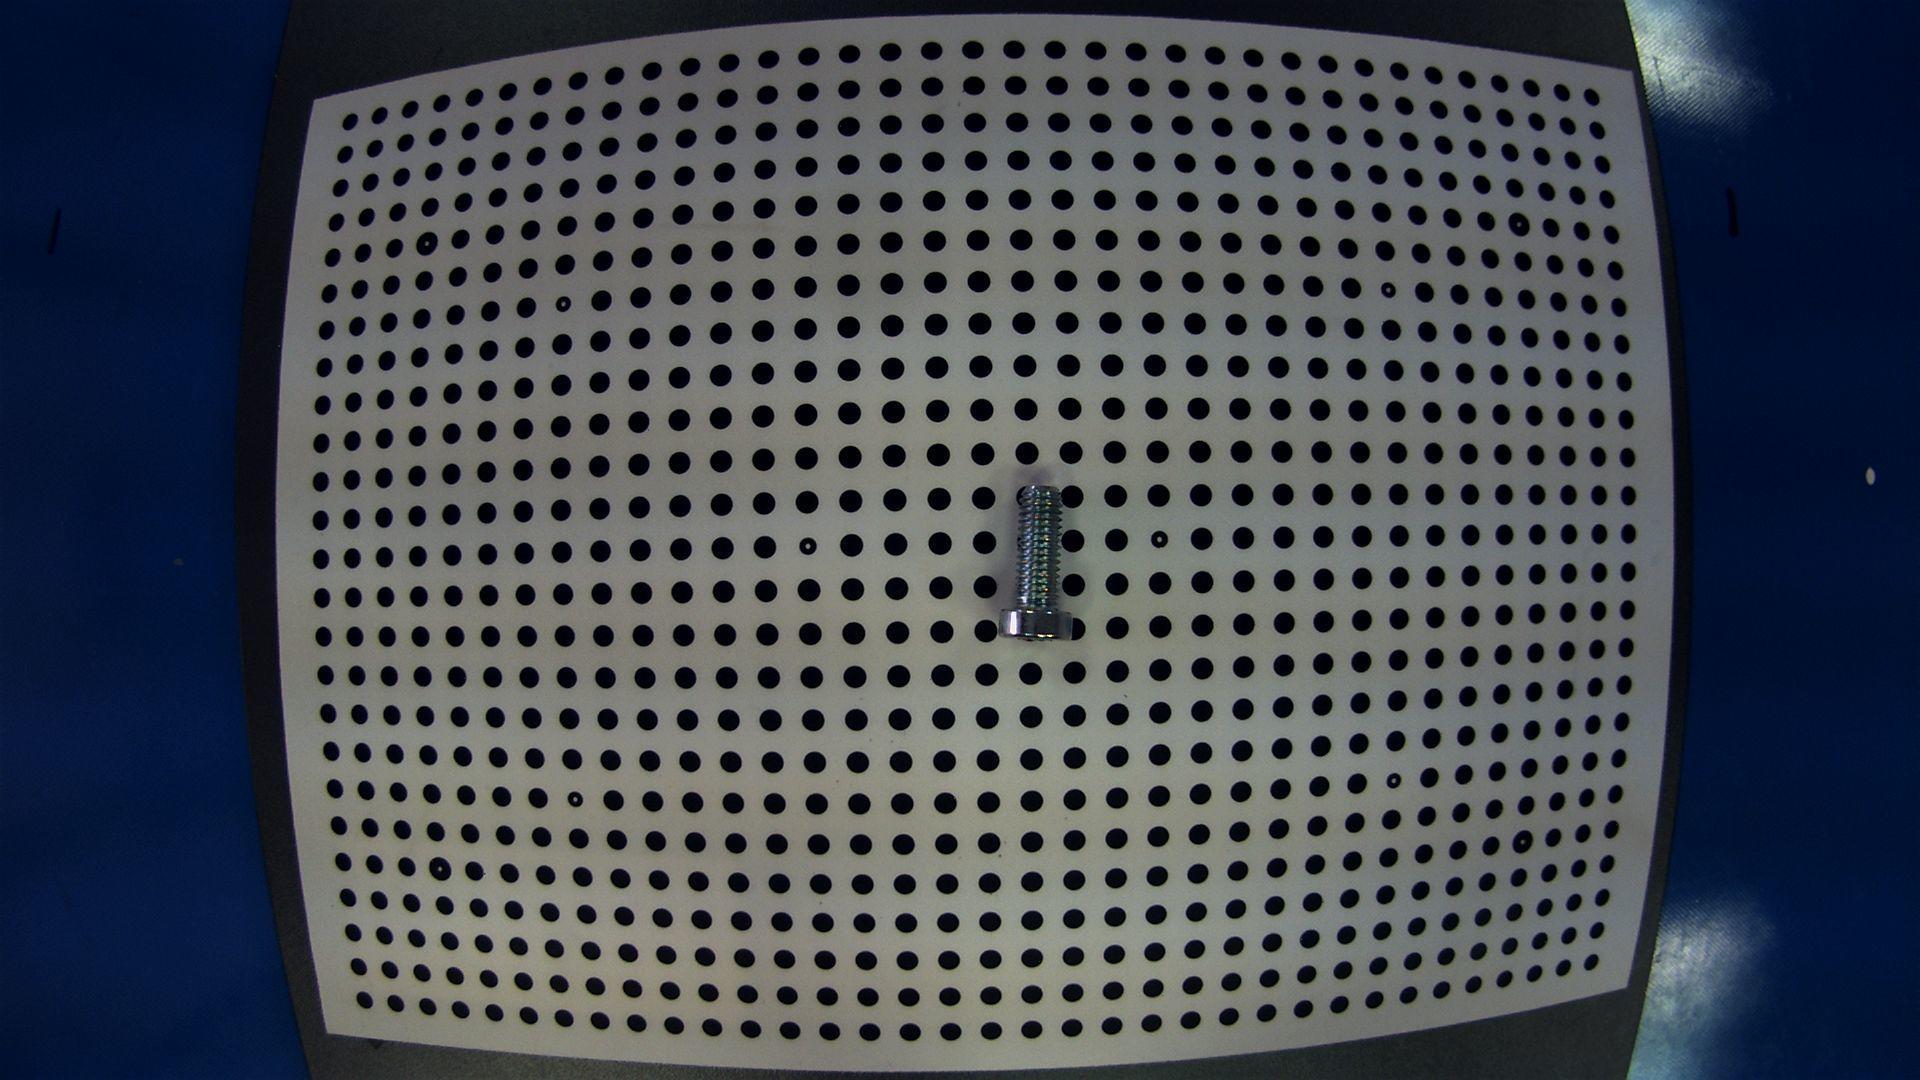 dfk-afux236-m12-svl-ir02820b5m-192mm.jpg